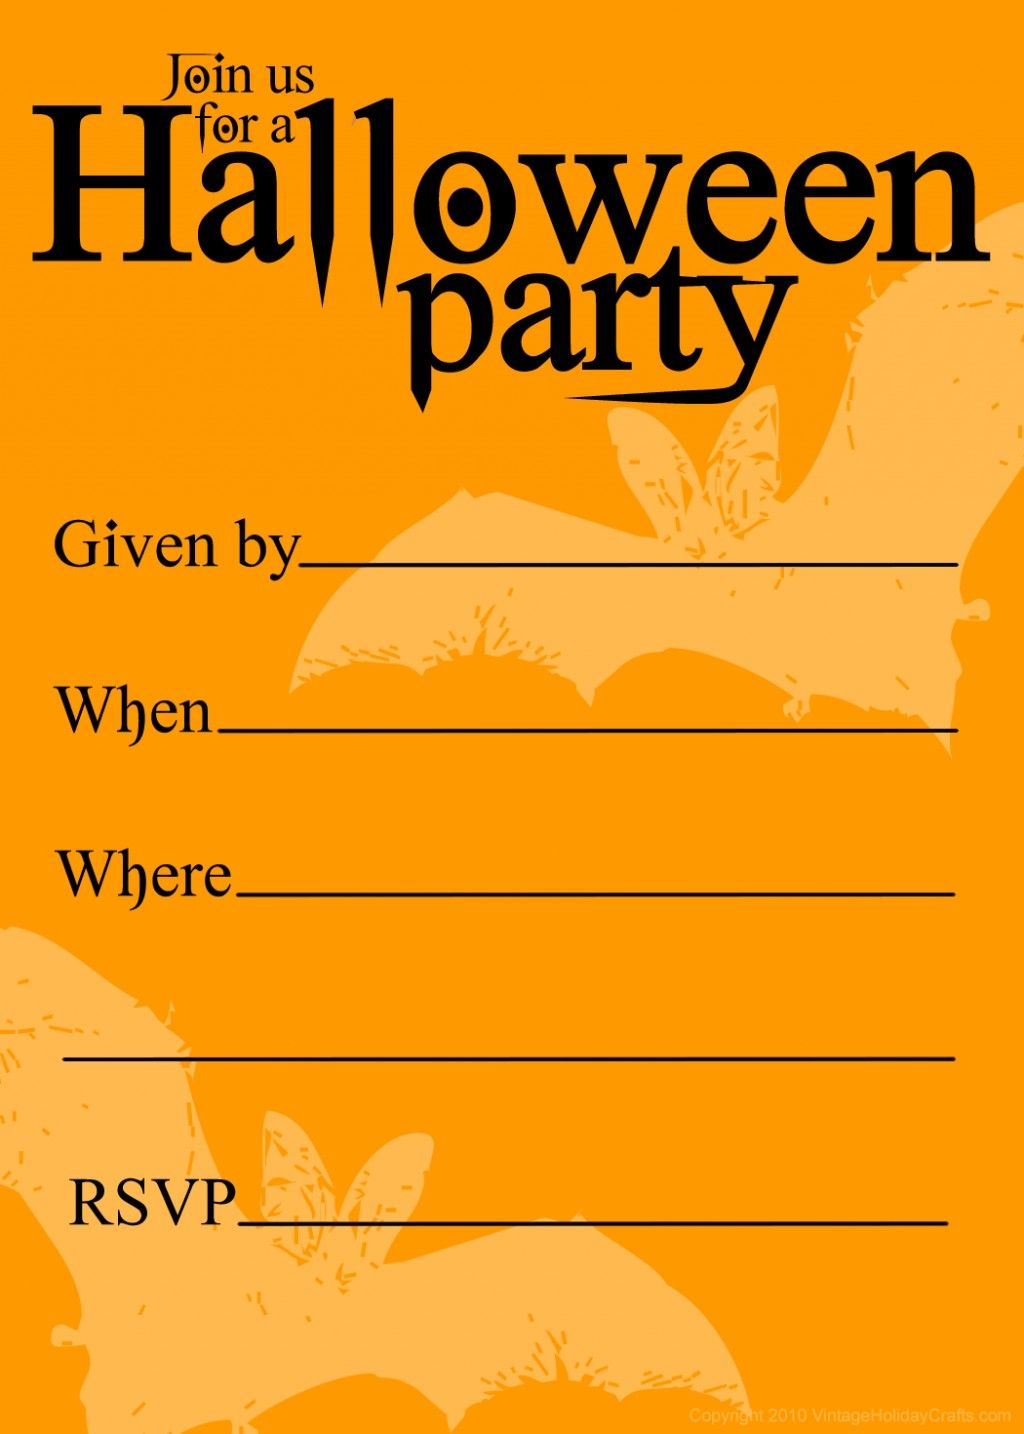 Free Printable Halloween Birthday Invitations Templates | Halloween - Free Printable Halloween Party Decorations